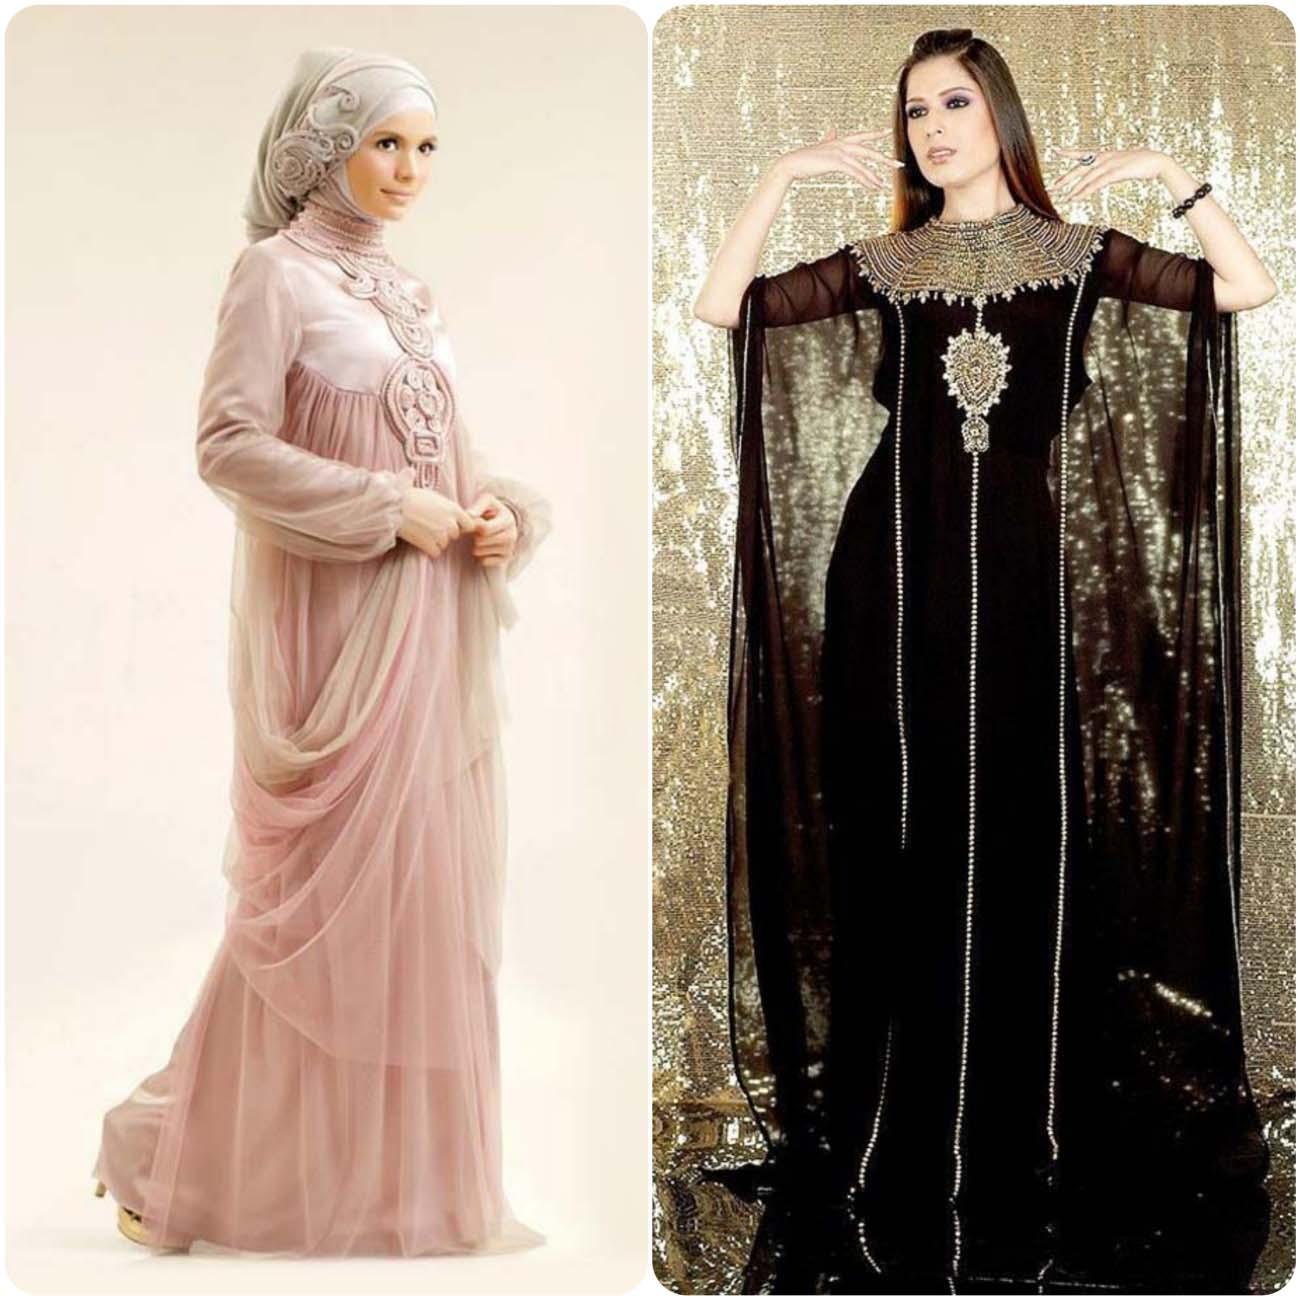 Designers Abaya Dresses Designs For Wedding Bridals 2016-2017...styloplanet (13)